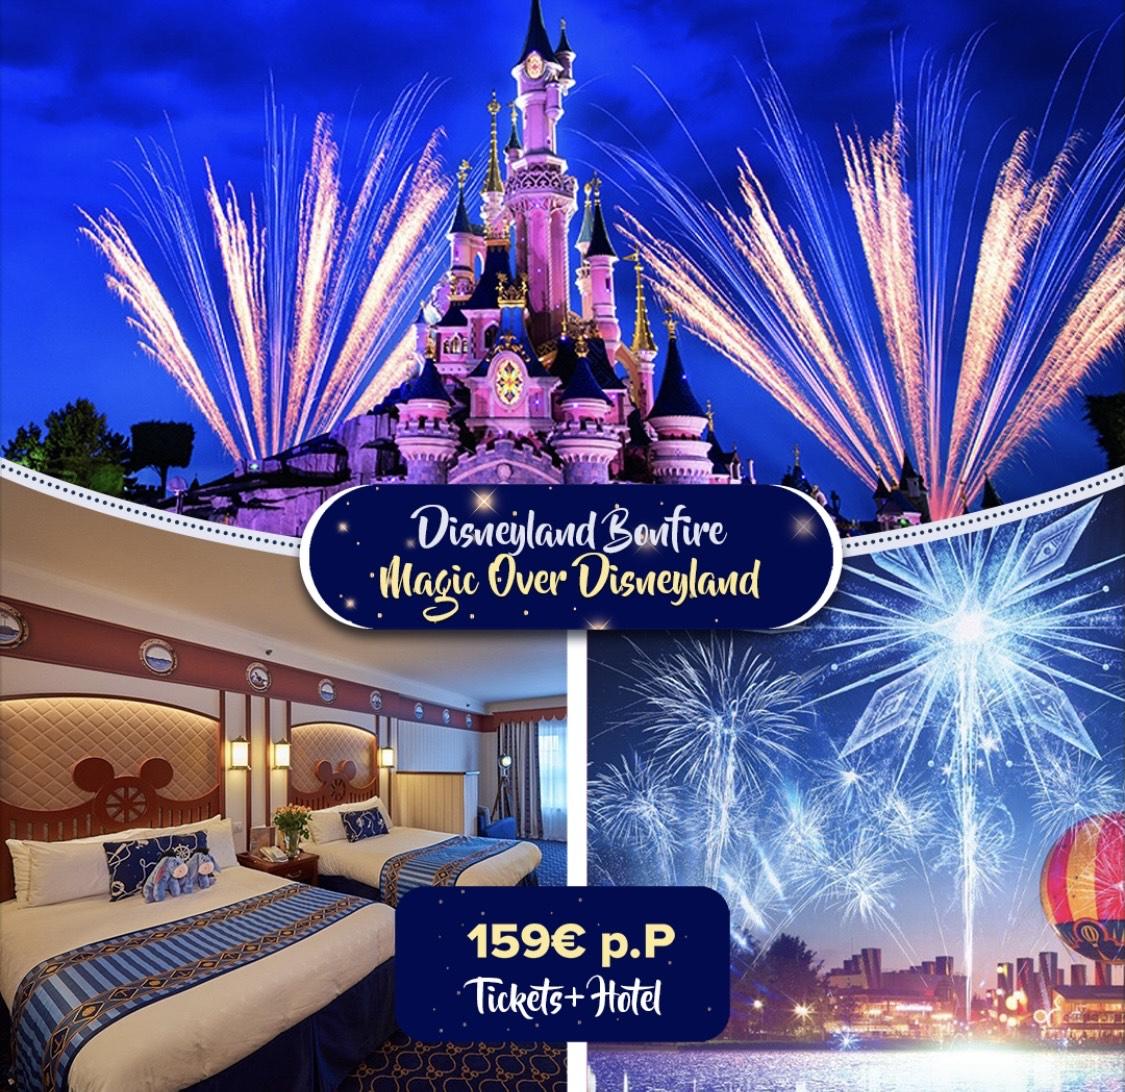 Disneyland Magical Fireworks & Bonfire 2., 4. und 9. November 2021